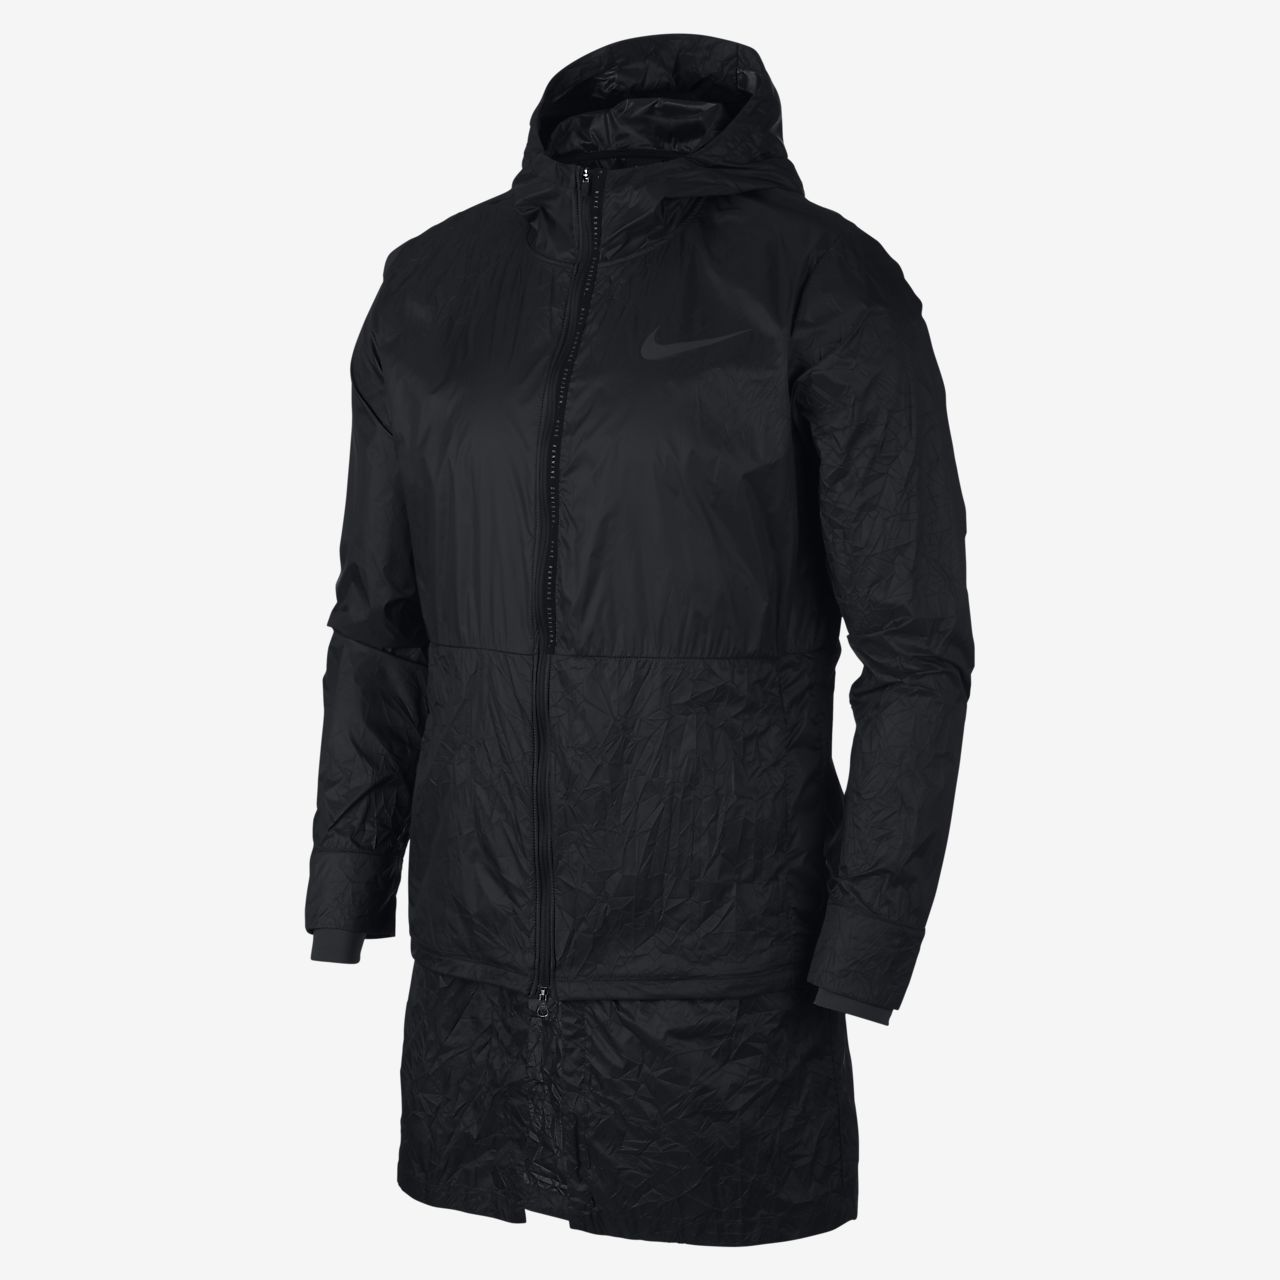 Nike Drop Hem Men's Running Jacket